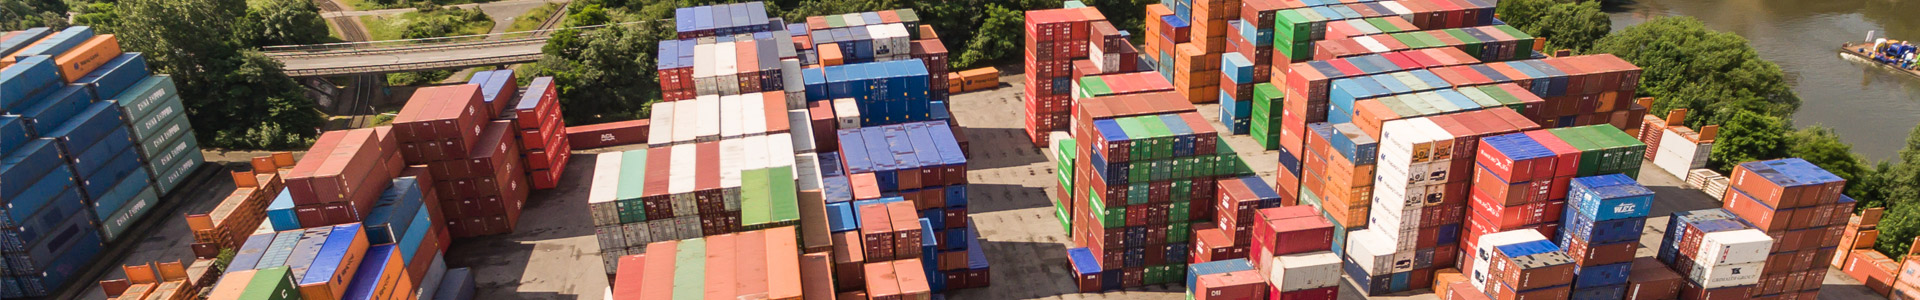 containerlagerung5